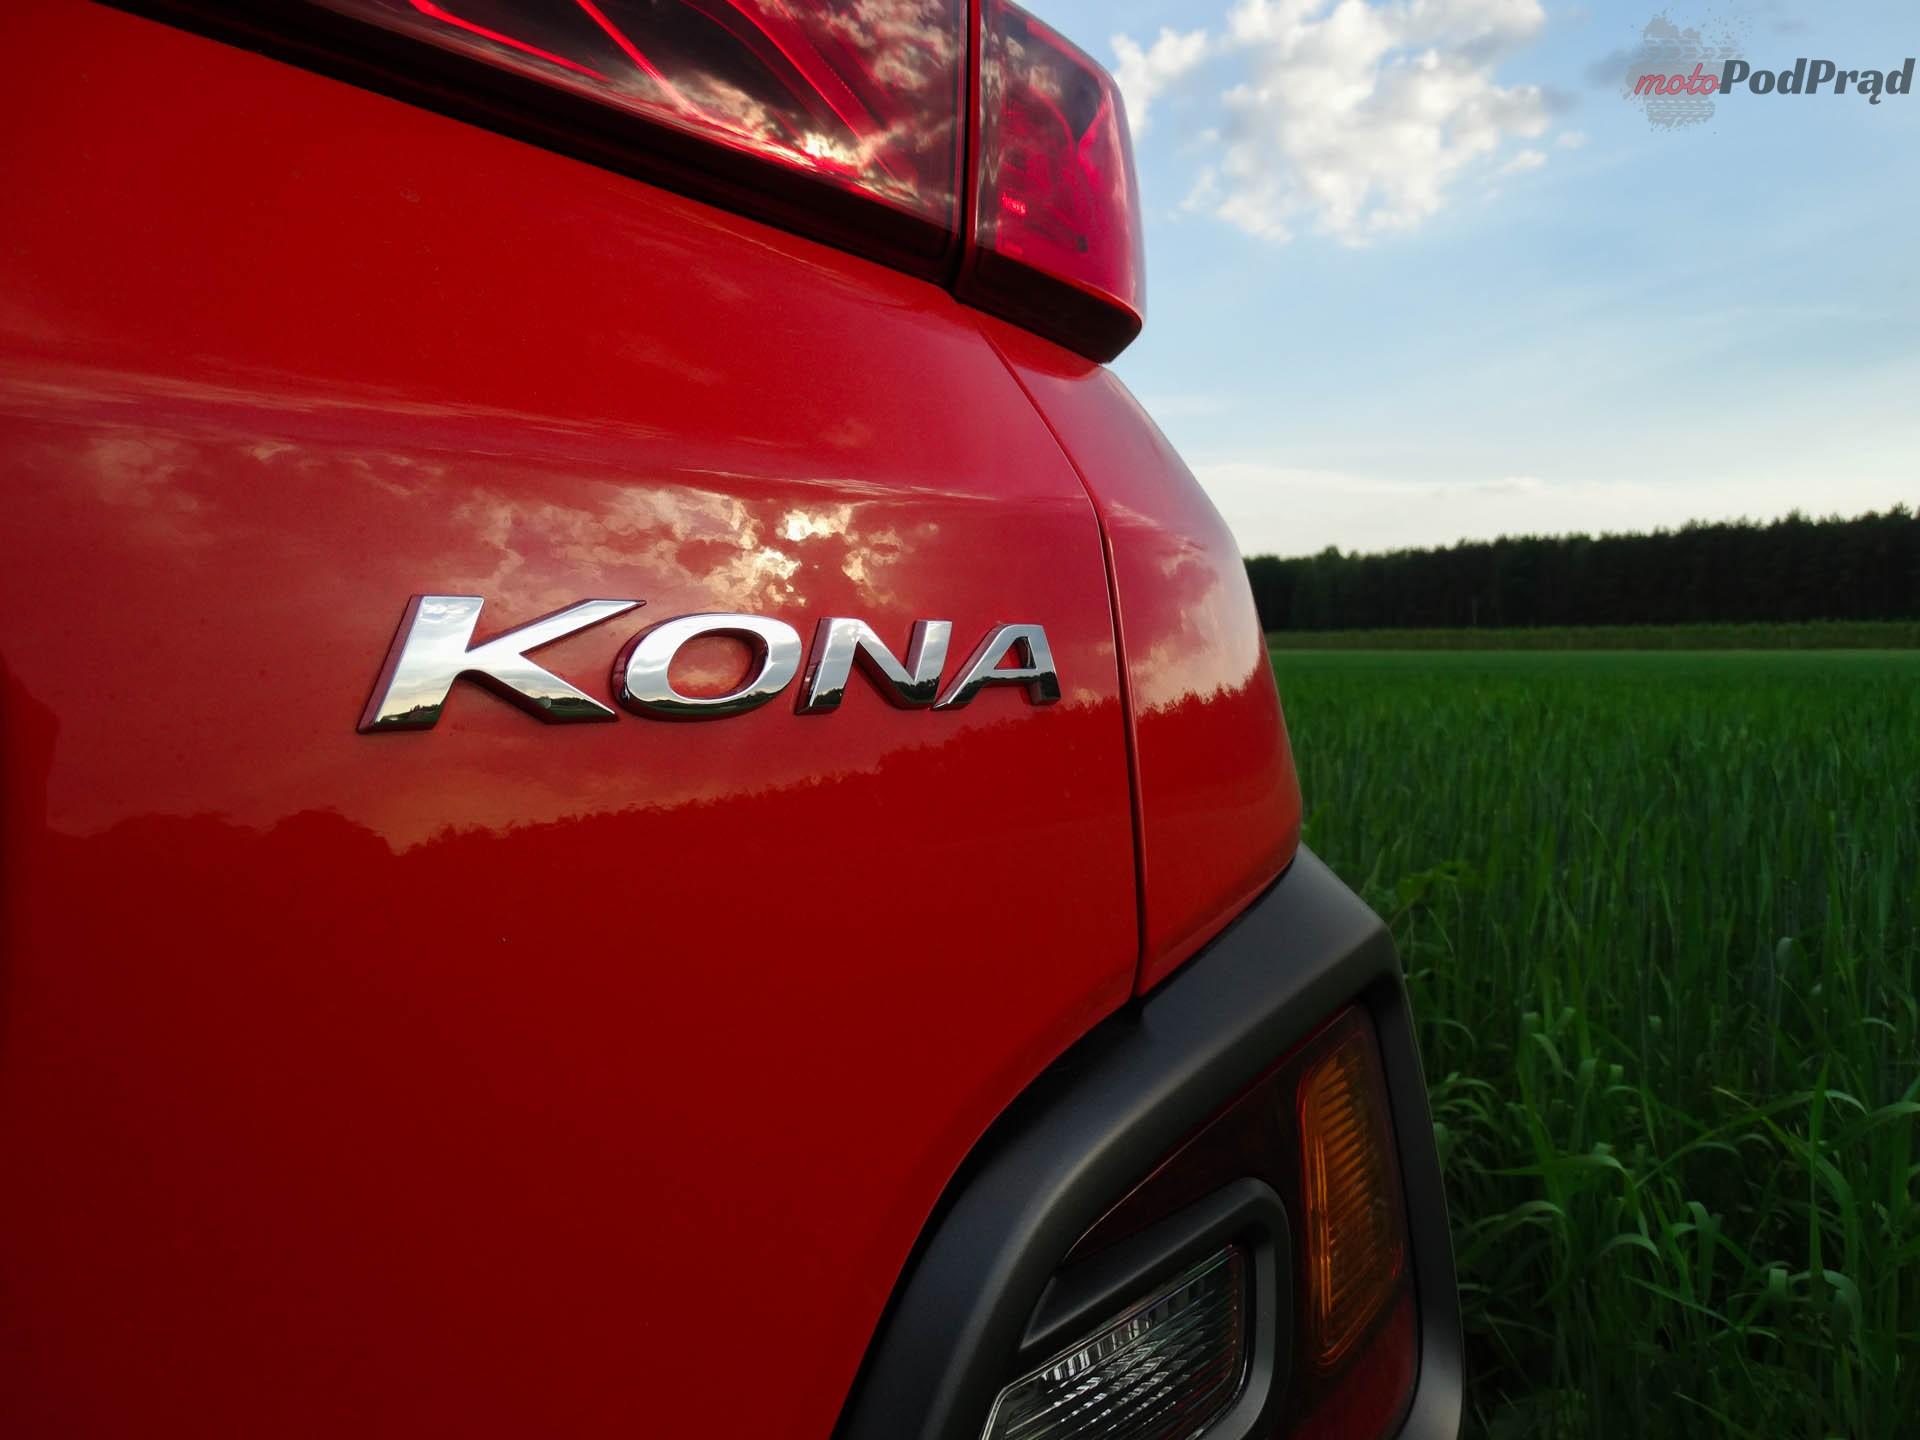 Hyundai Kona 9 Porównanie: Hyundai Kona 1.0 kontra Seat Arona 1.0